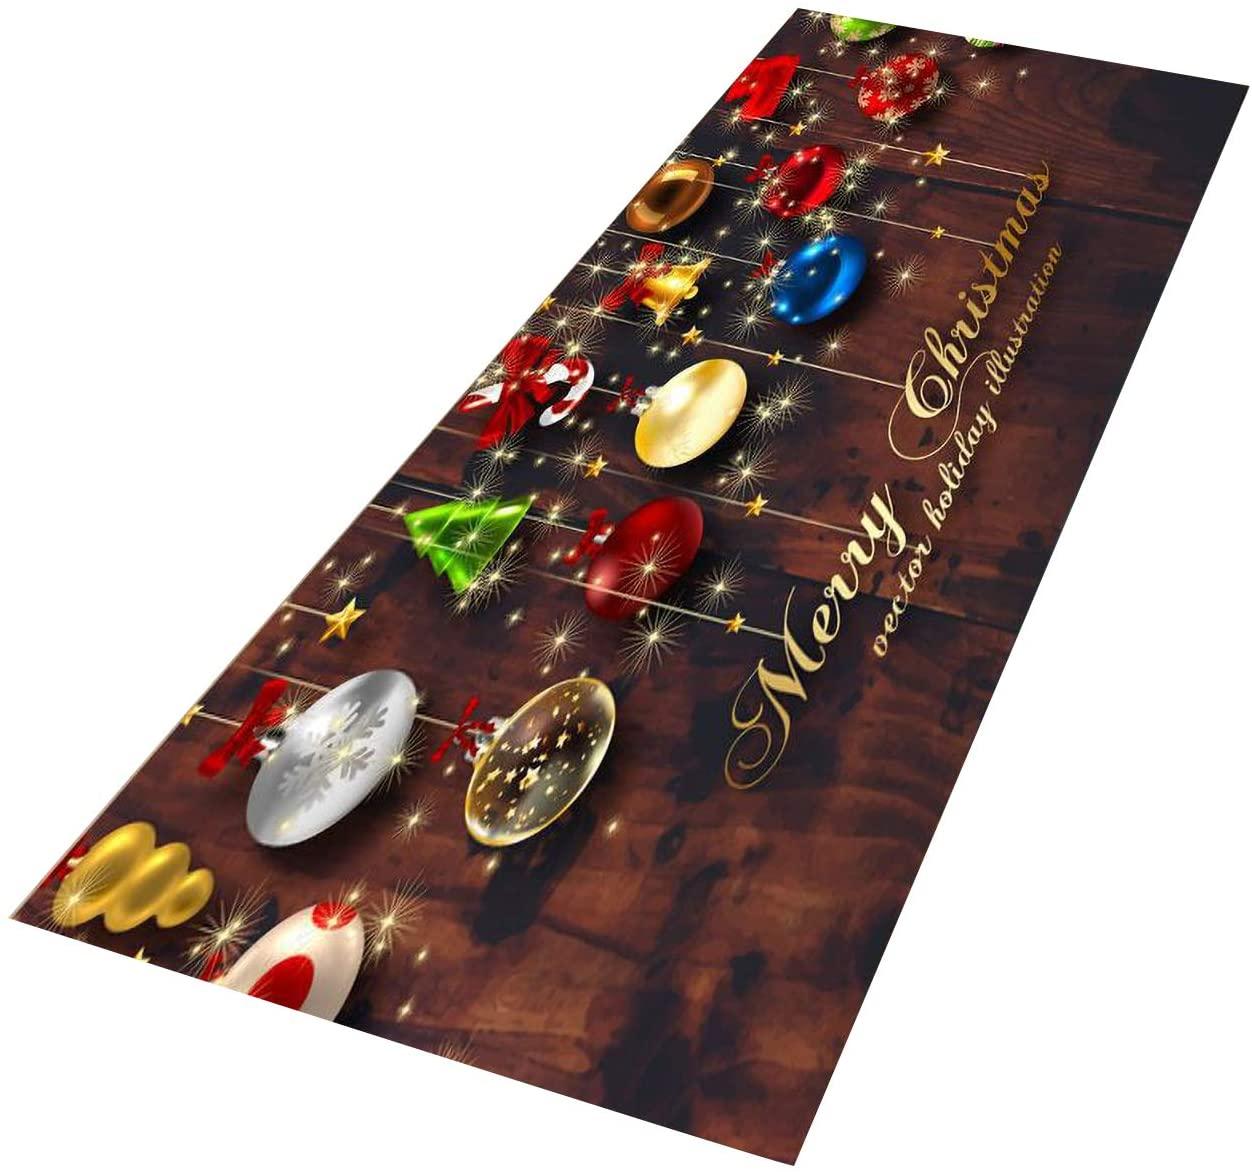 Crafttable 2 Pieces Merry Christmas Kitchen Rug Set, Anti-Fatigue Kitchen Floor Mat, Non Slip Standing Carpet, 15.7x23.6+ 15.7x47.2 in, 32